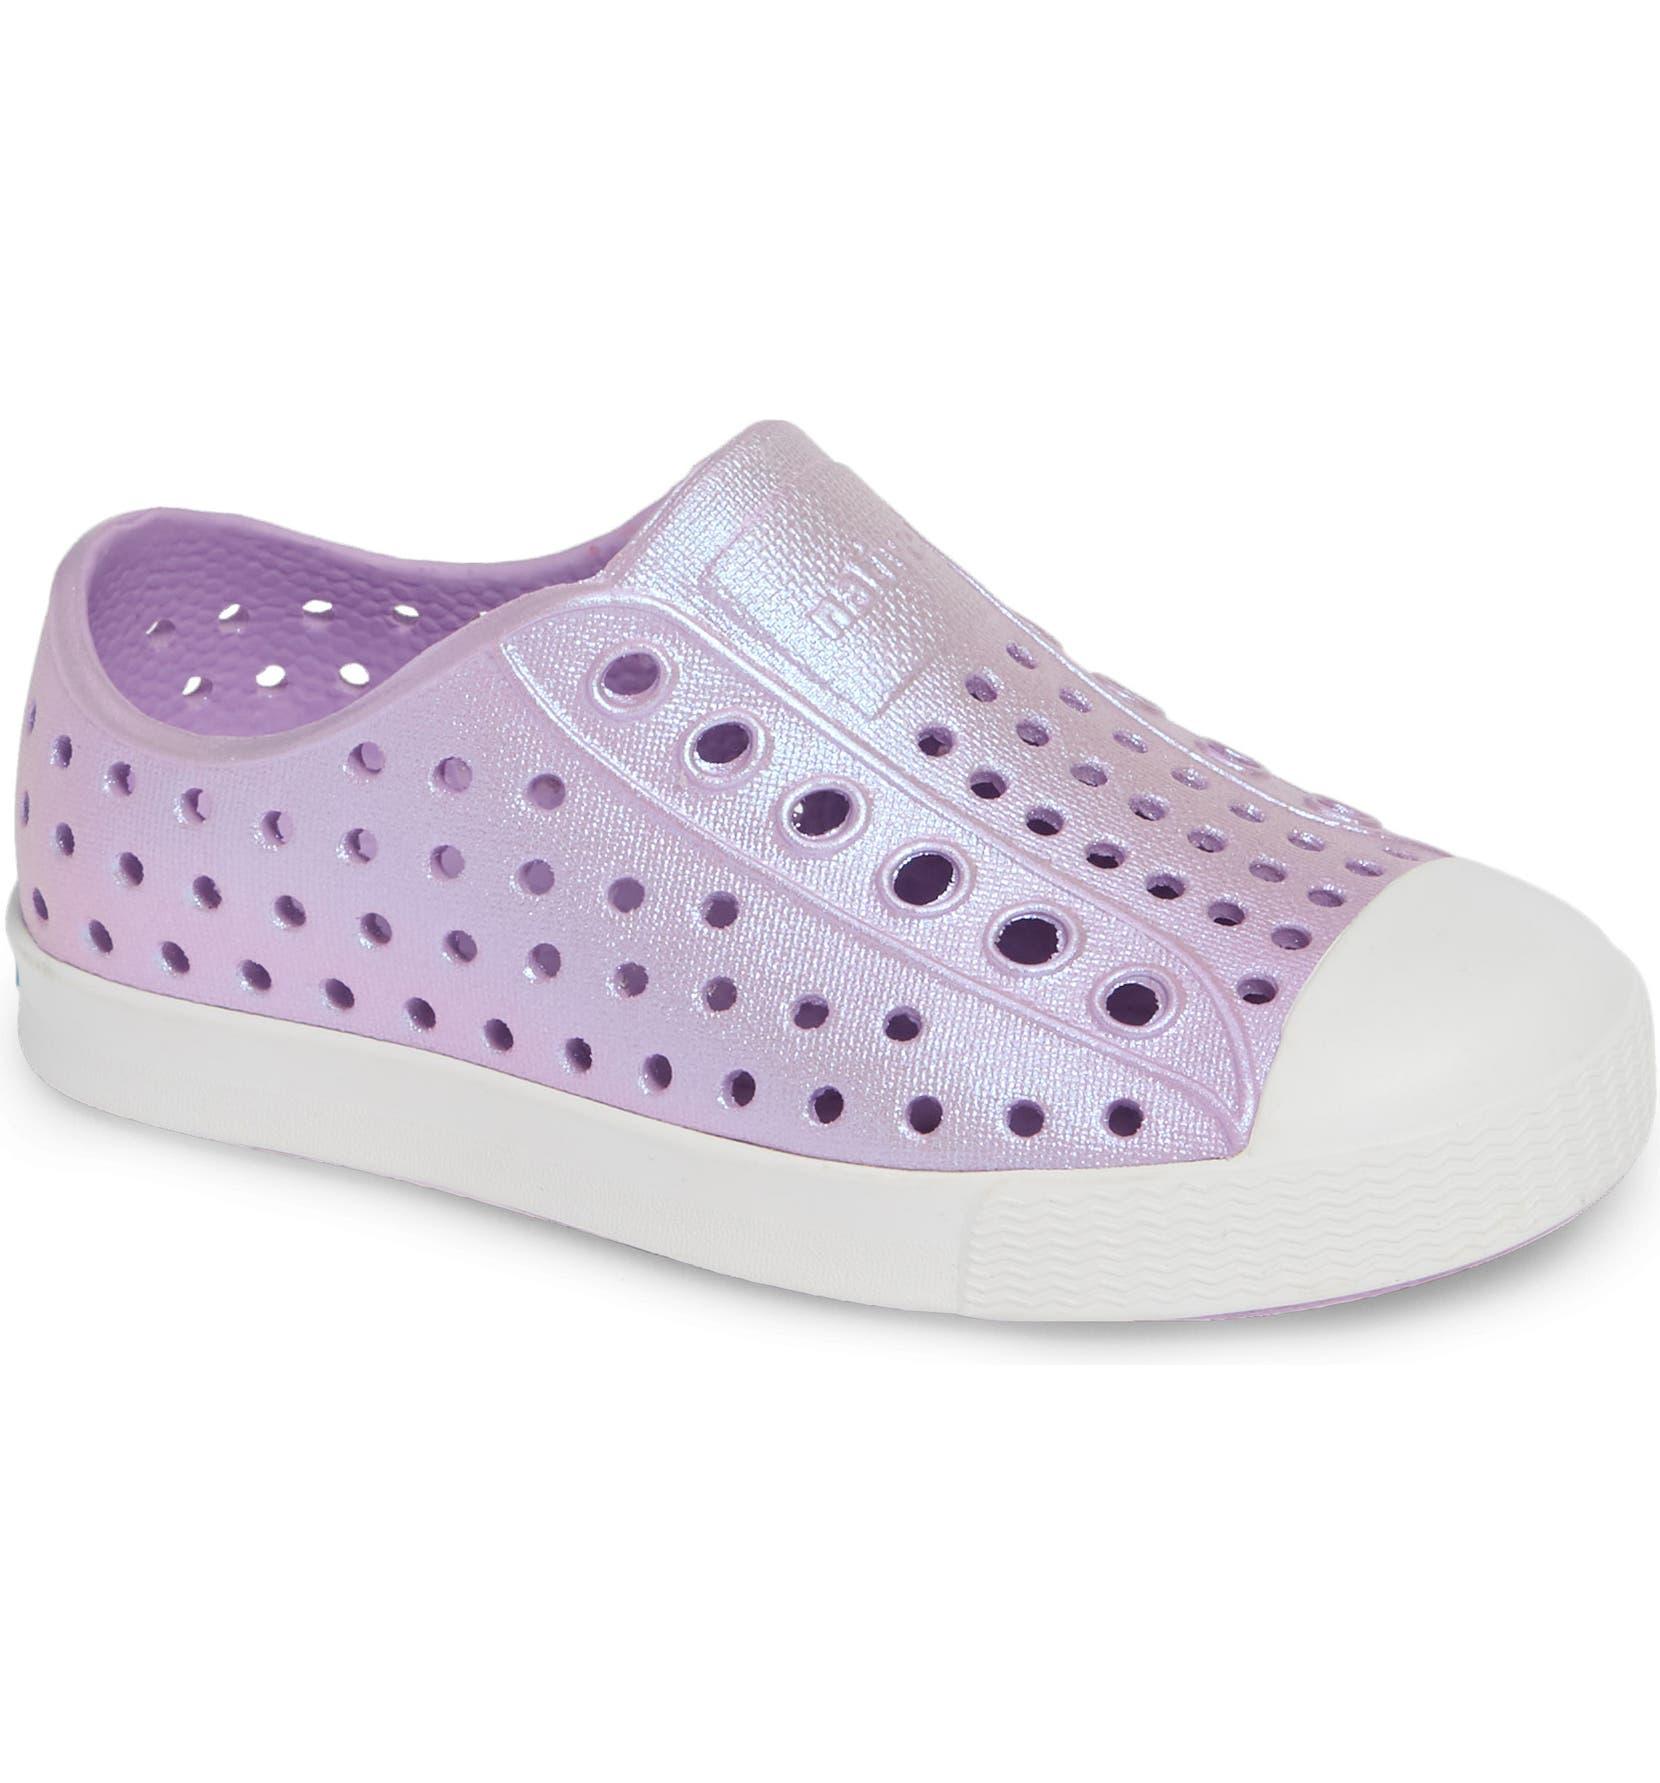 6216a7c75115 Native Shoes Jefferson Iridescent Slip-On Vegan Sneaker (Baby, Walker,  Toddler & Little Kid) | Nordstrom